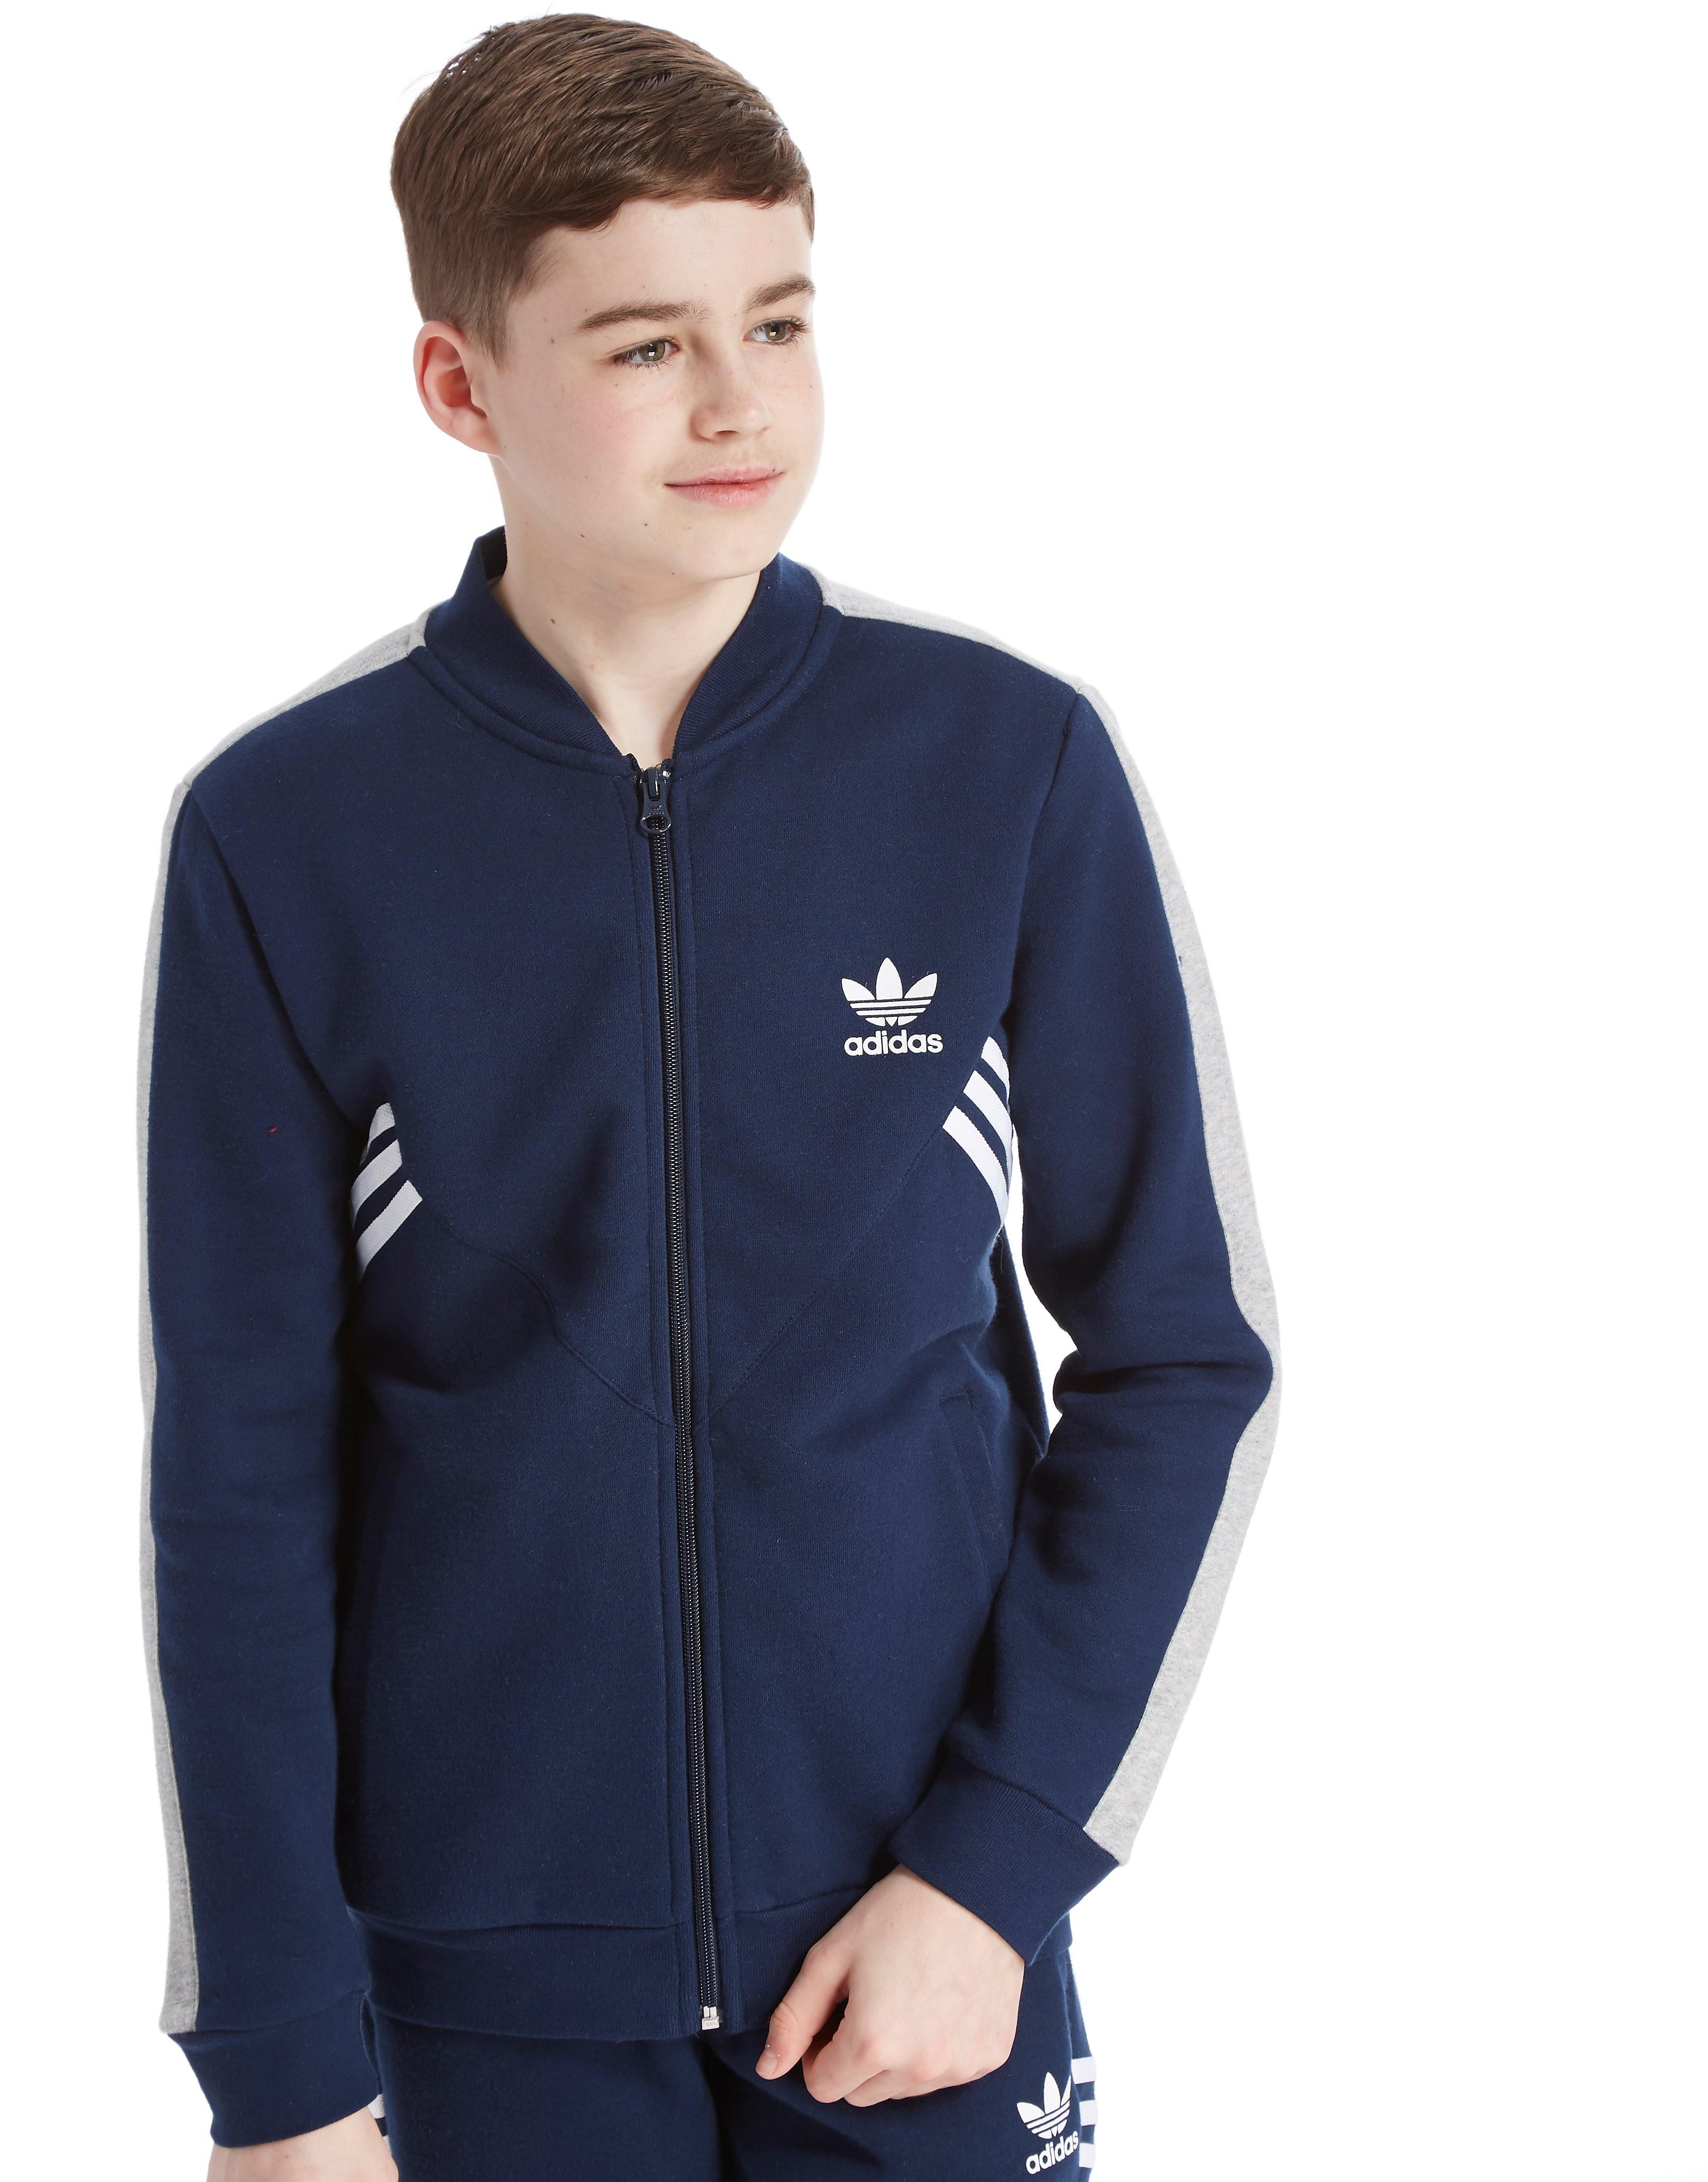 adidas Originals MOA Fleece Track Top Junior